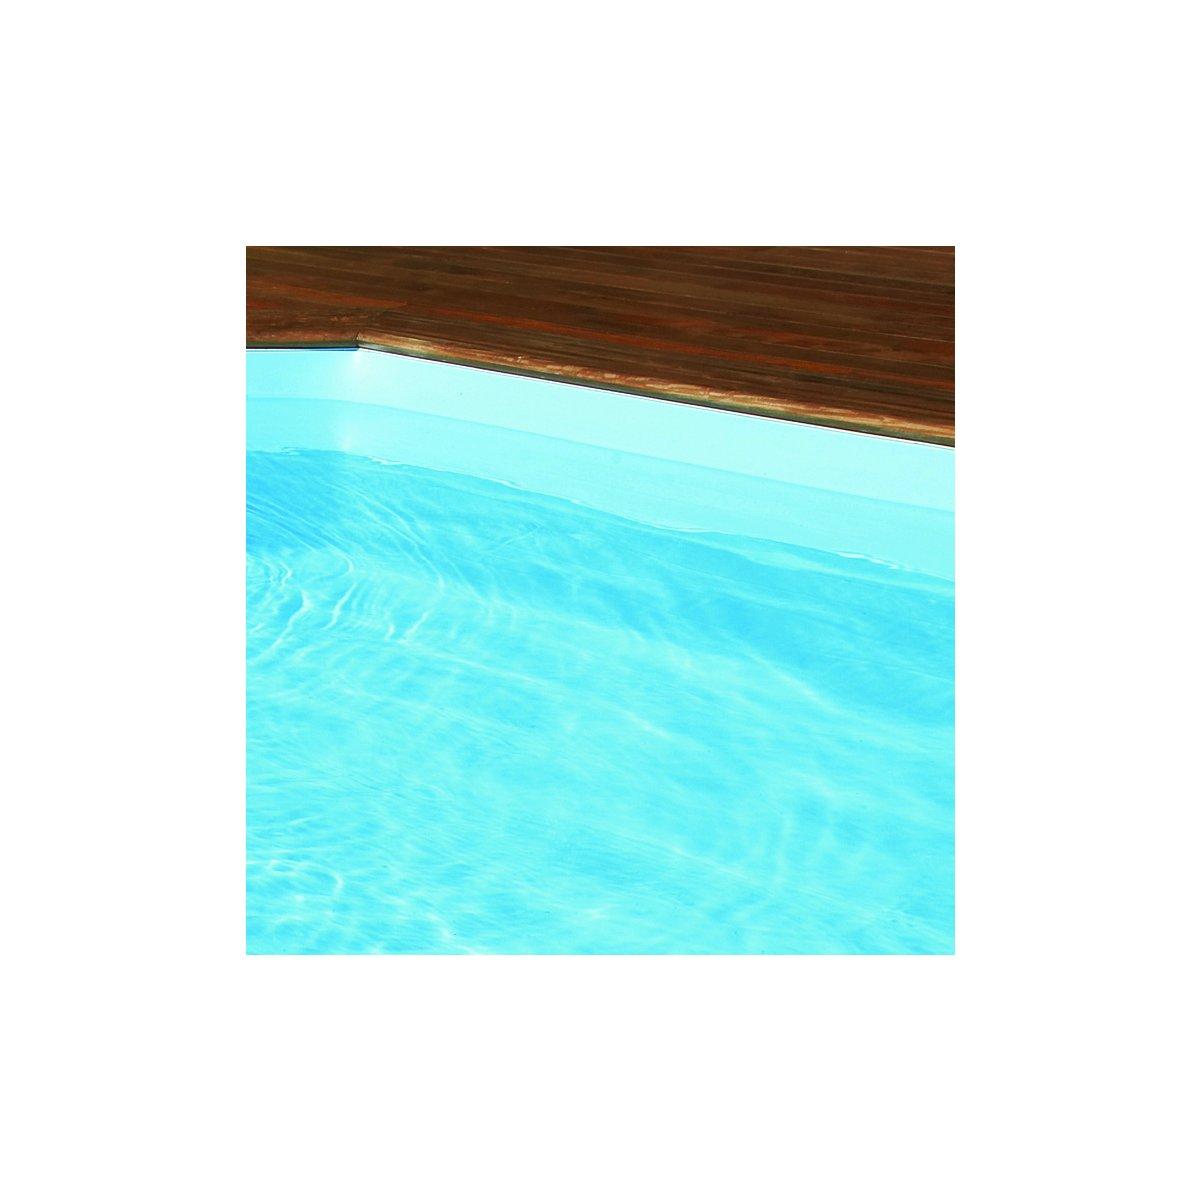 Poolfolie wellpool24 classic hellblau 13 50 for Poolfolie farbe